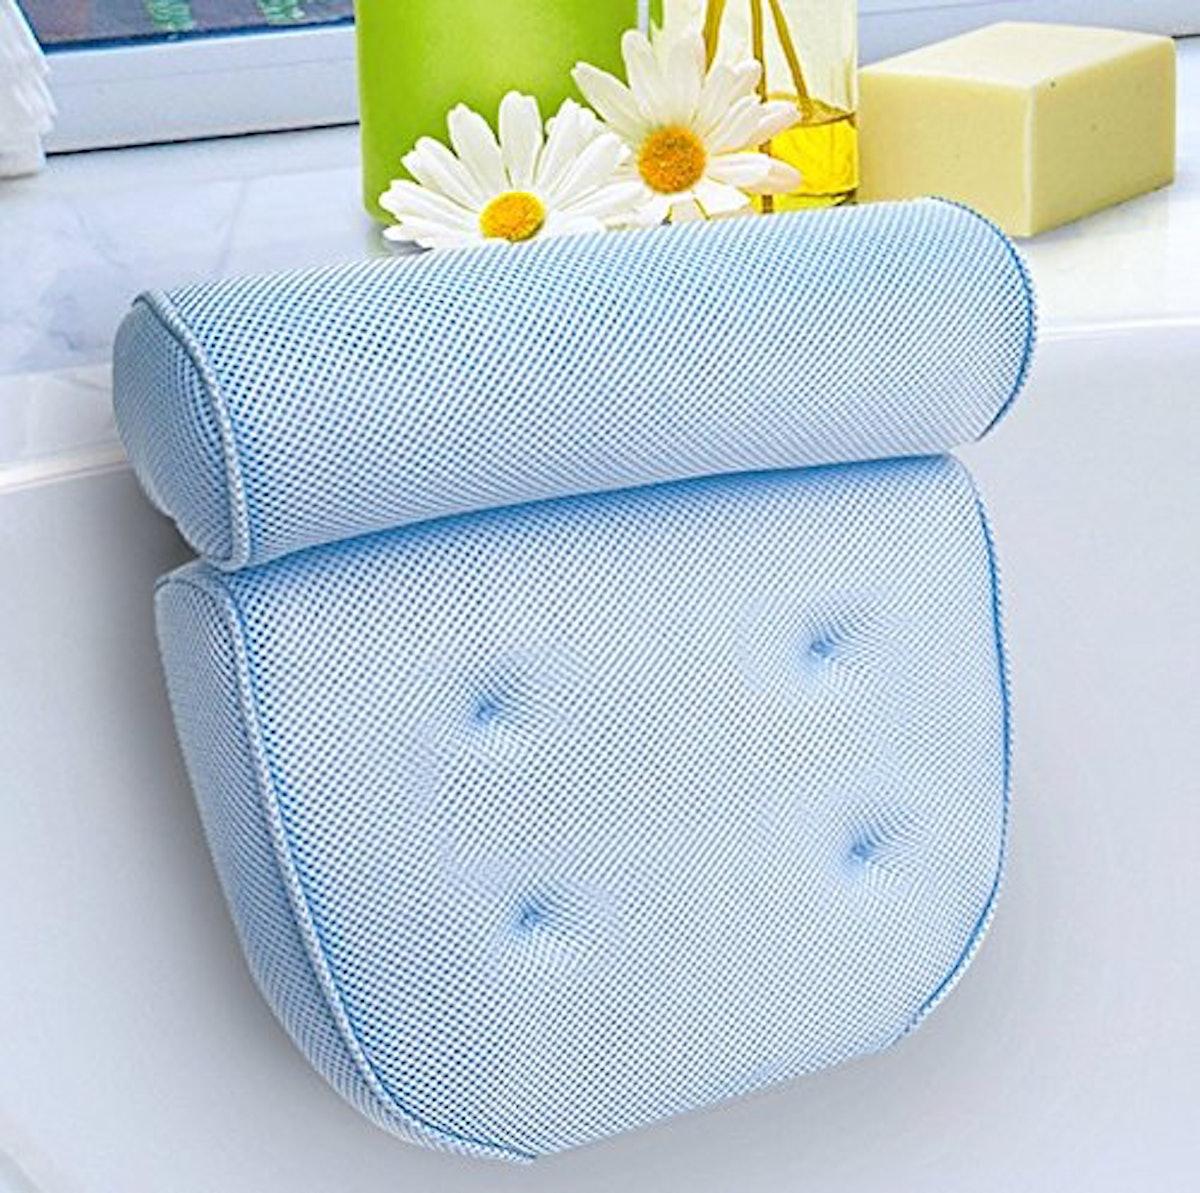 Kleeger Non Slip Bath Pillow